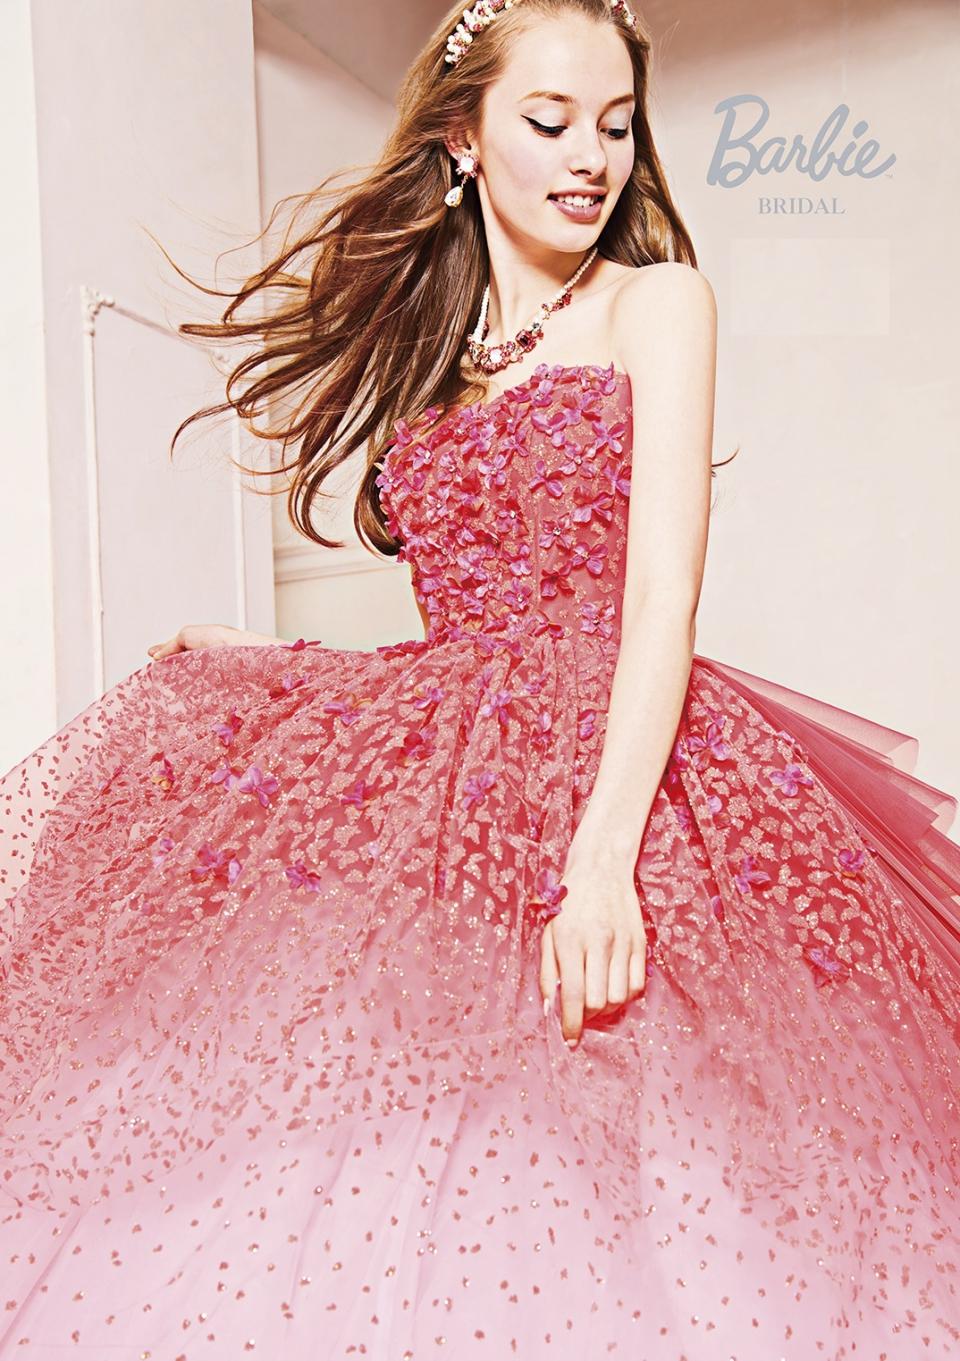 Barbie BRIDAL カラ-ドレスピンク